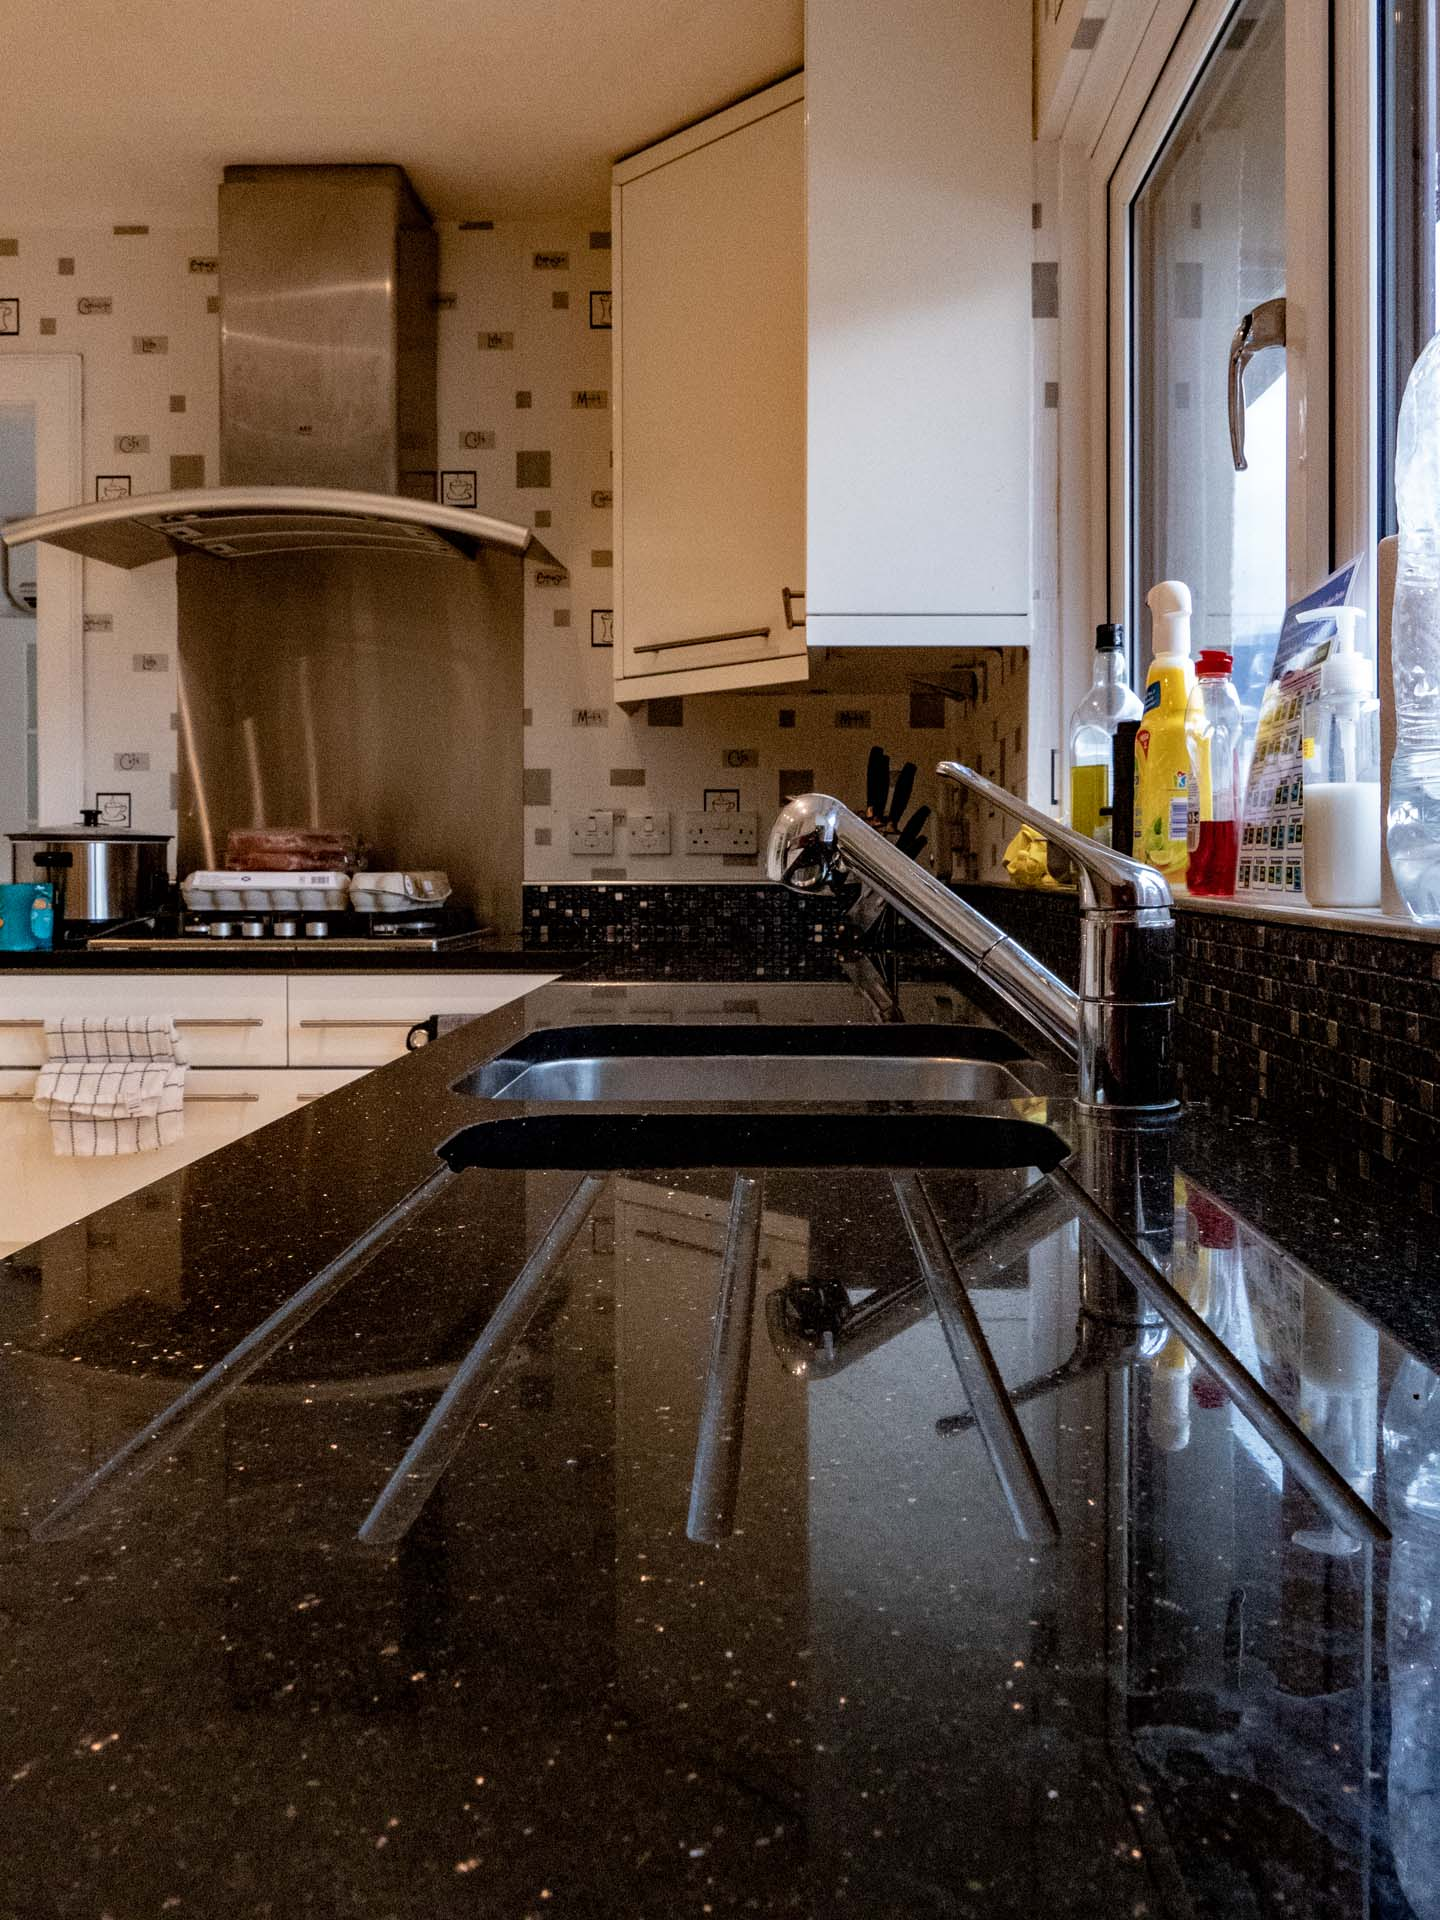 Black Galaxy Granite worktops charlwood reigate surrey sloping drainer grooves 121259a